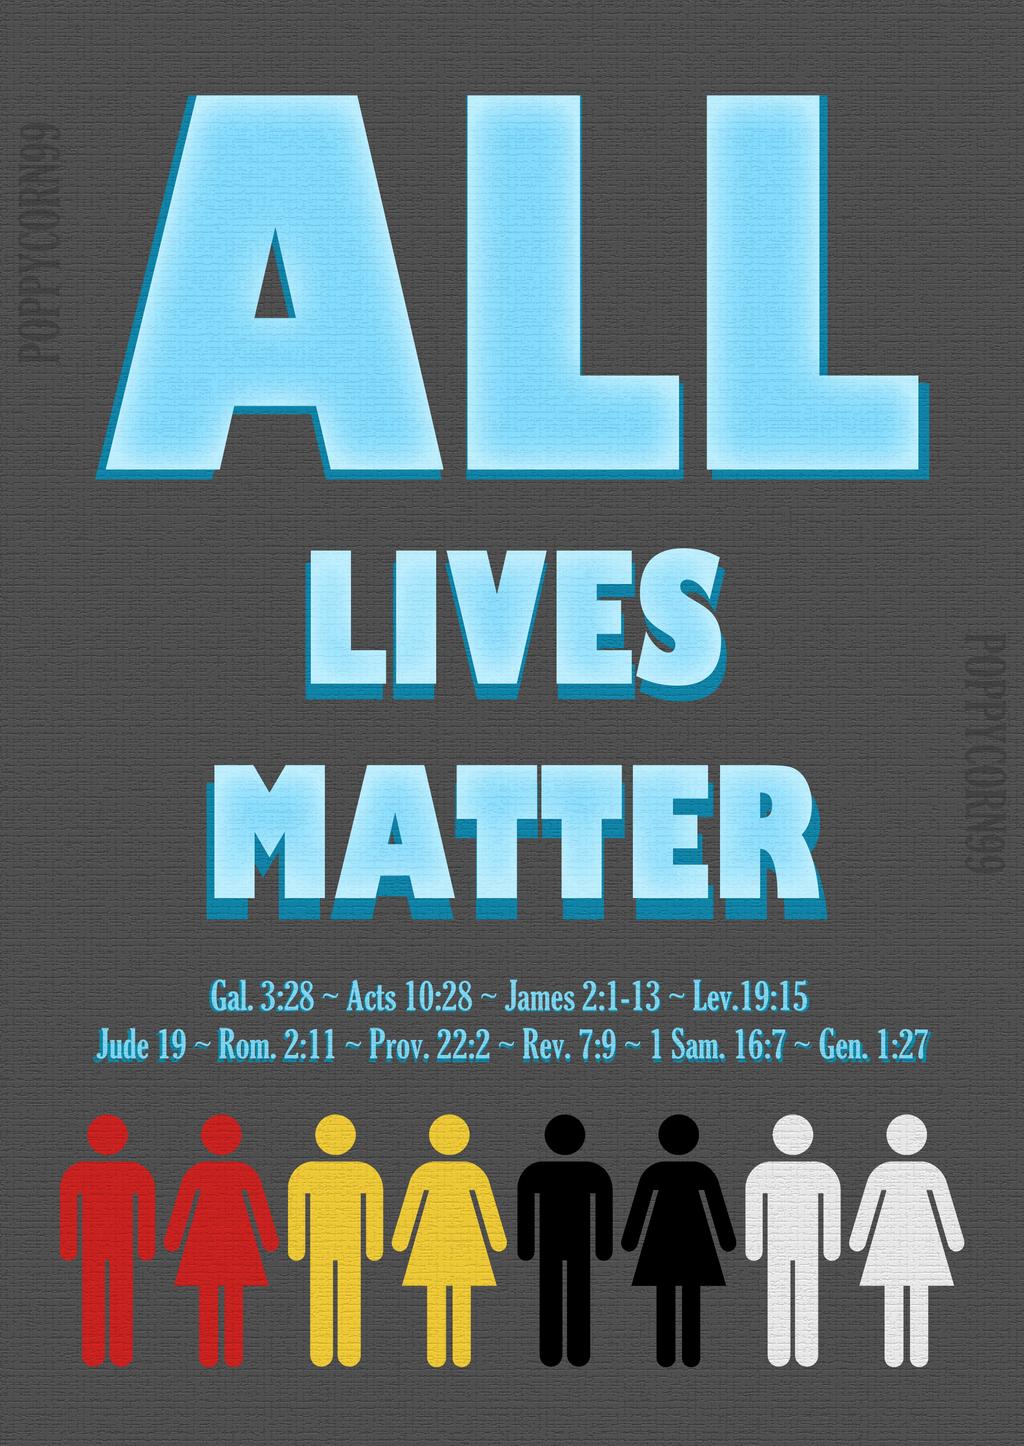 all_lives_matter_by_poppycorn99-d95zsuw